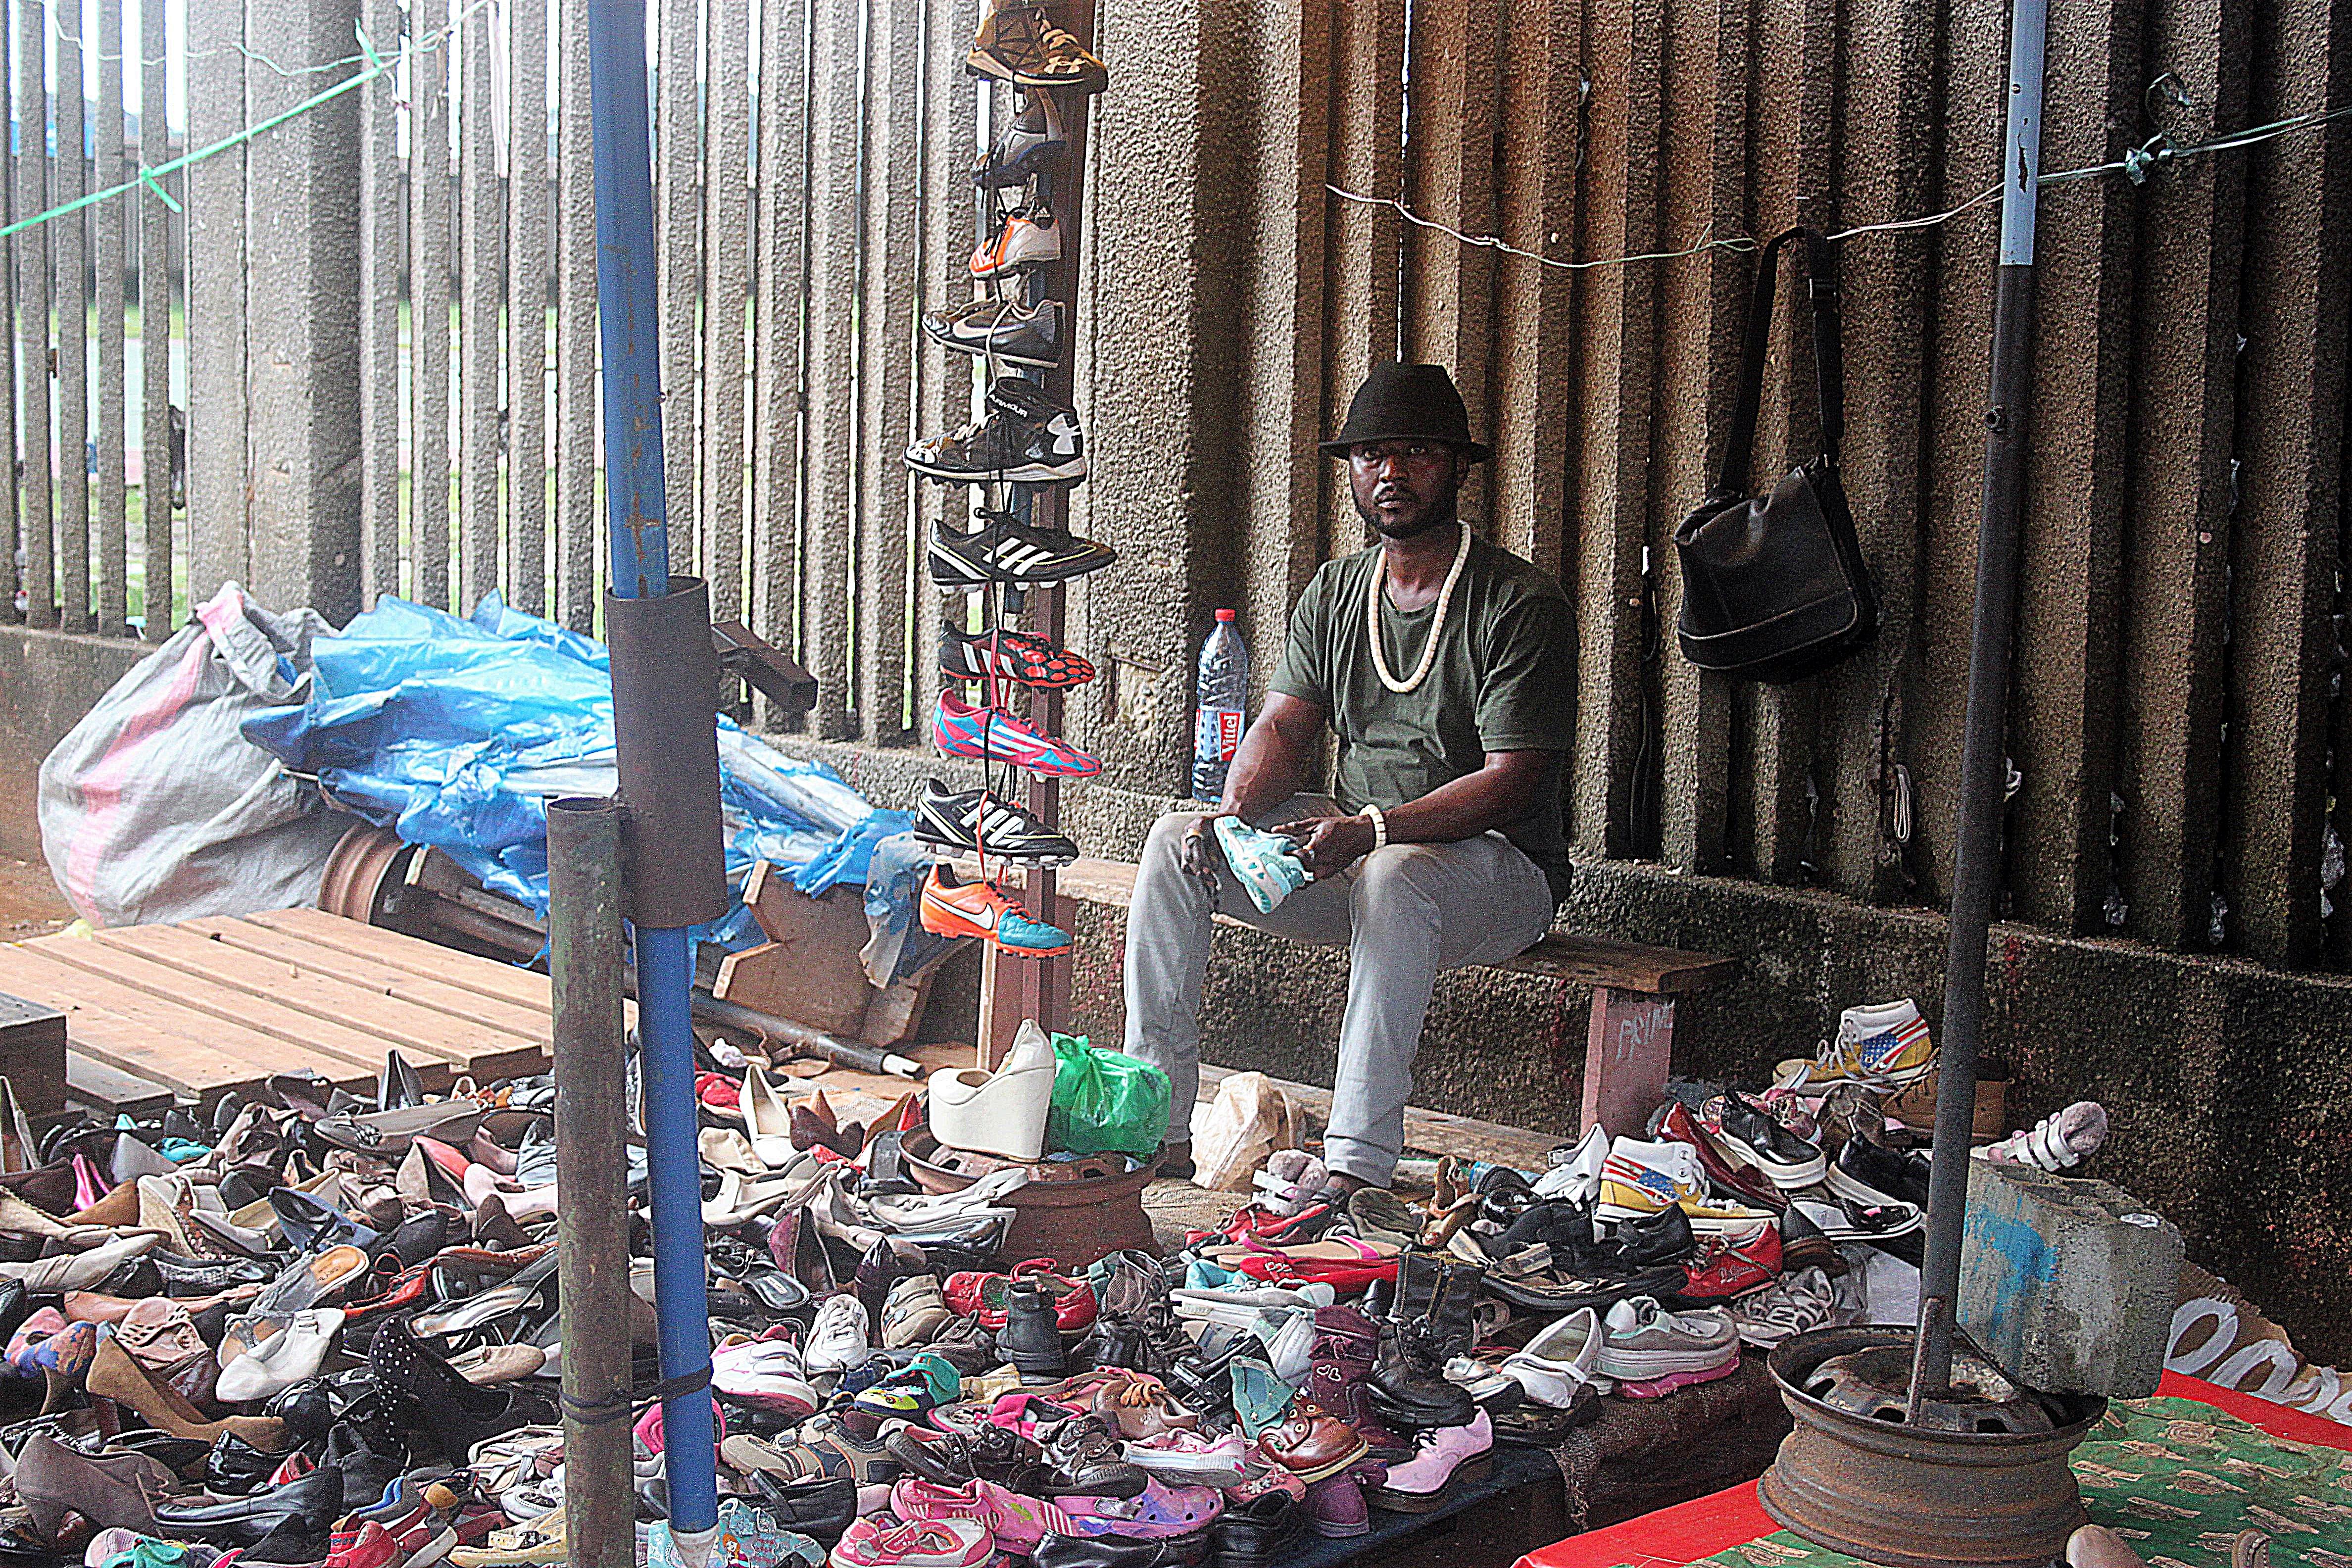 b4bb067153ed09 File:Vendeur de chaussure.jpg - Wikimedia Commons